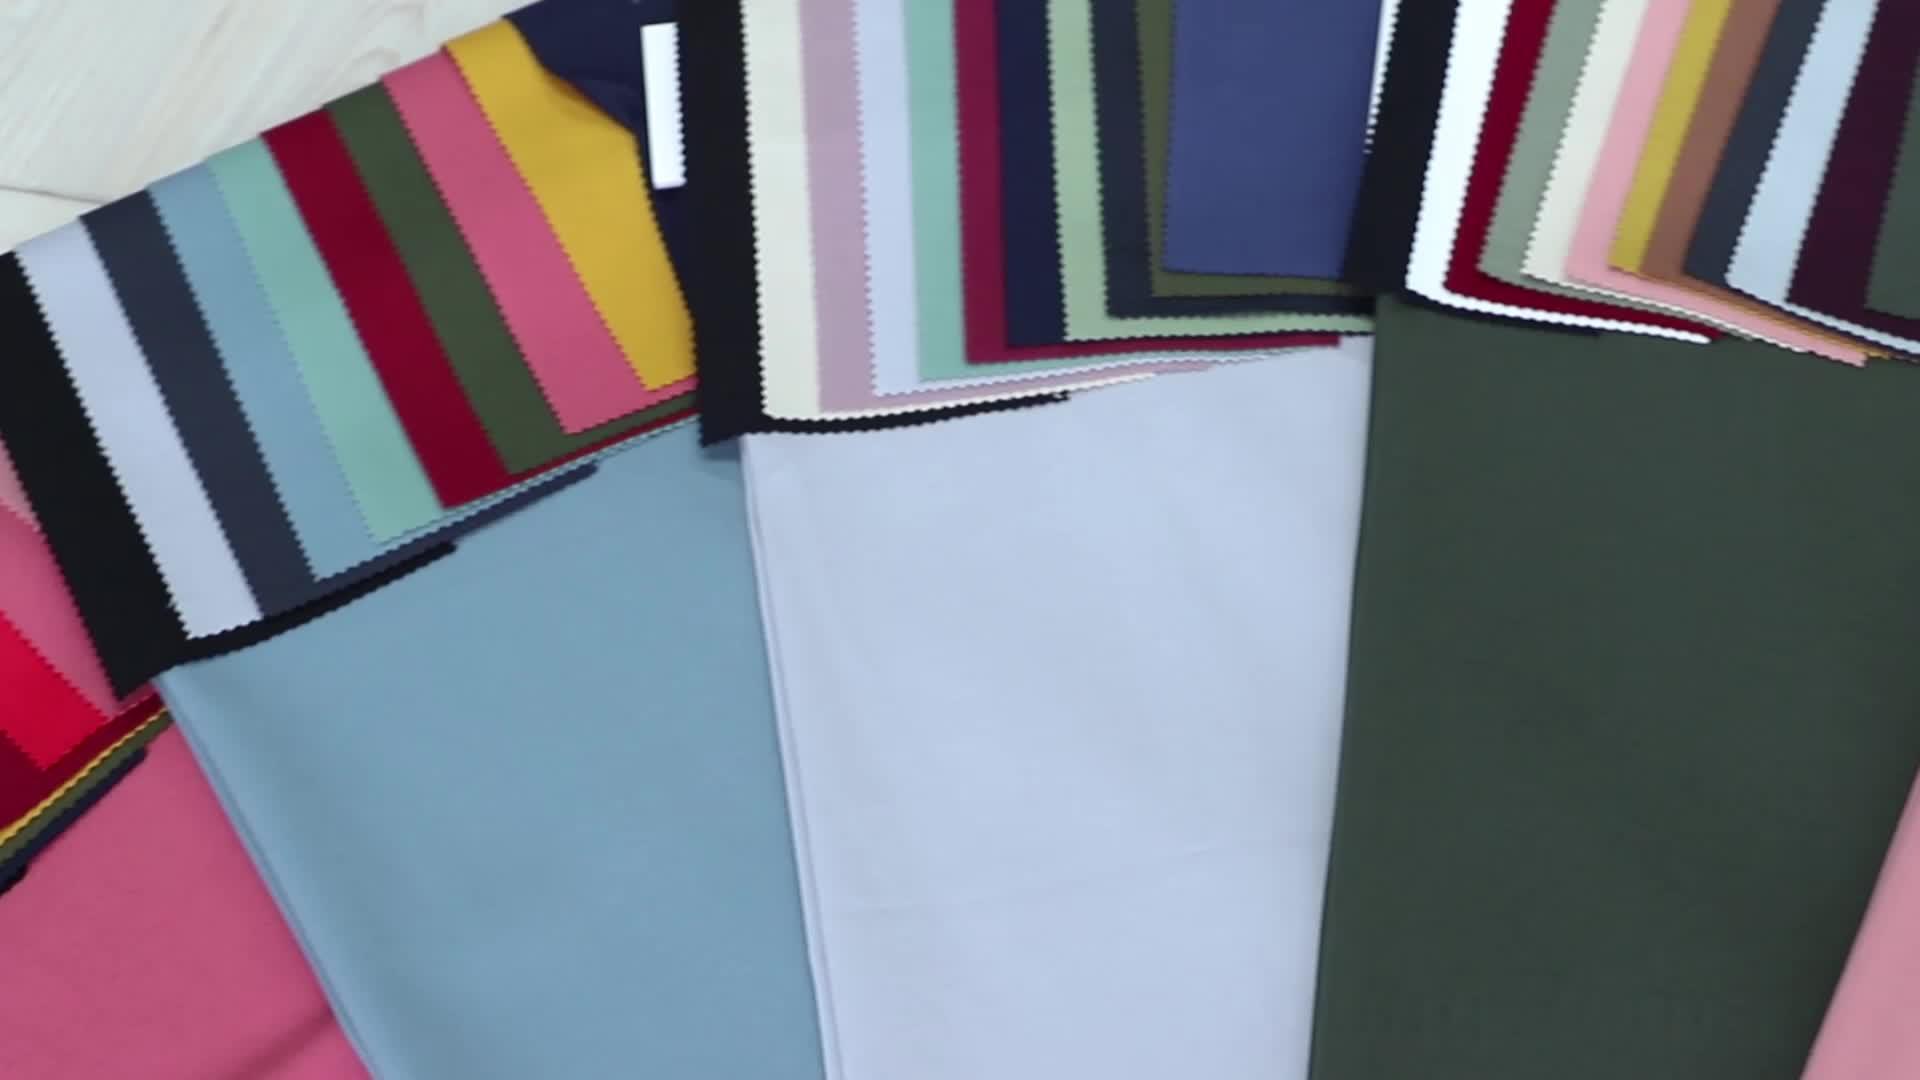 National style jacquard upholstery china knitting plaid fabric